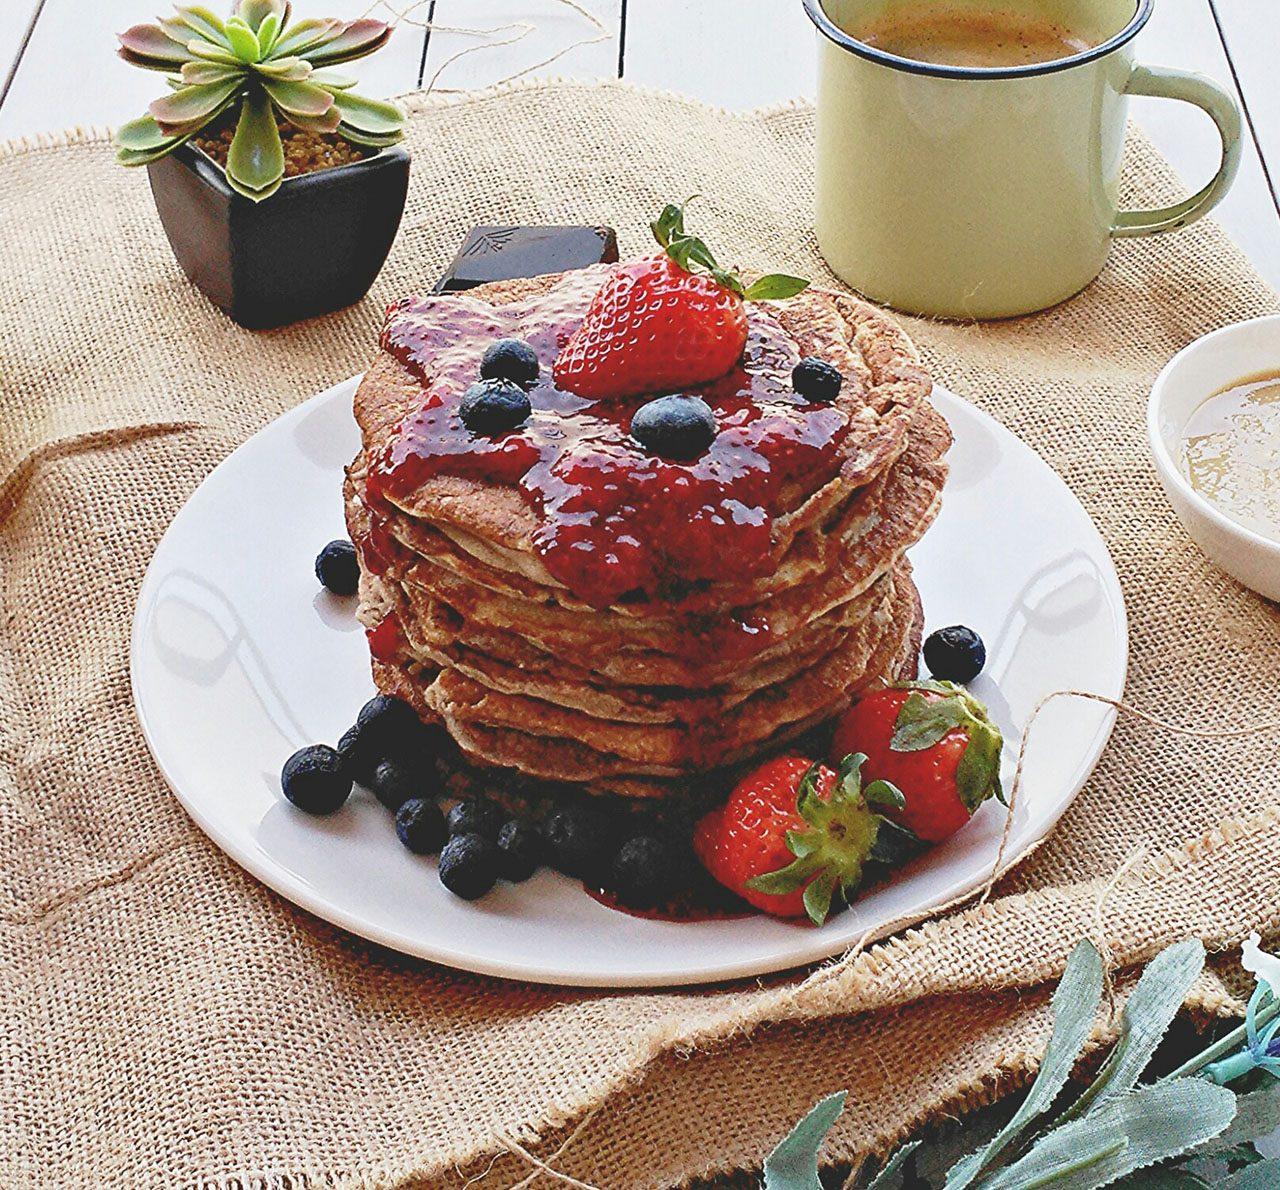 Pancakes de trigo sarraceno especiados